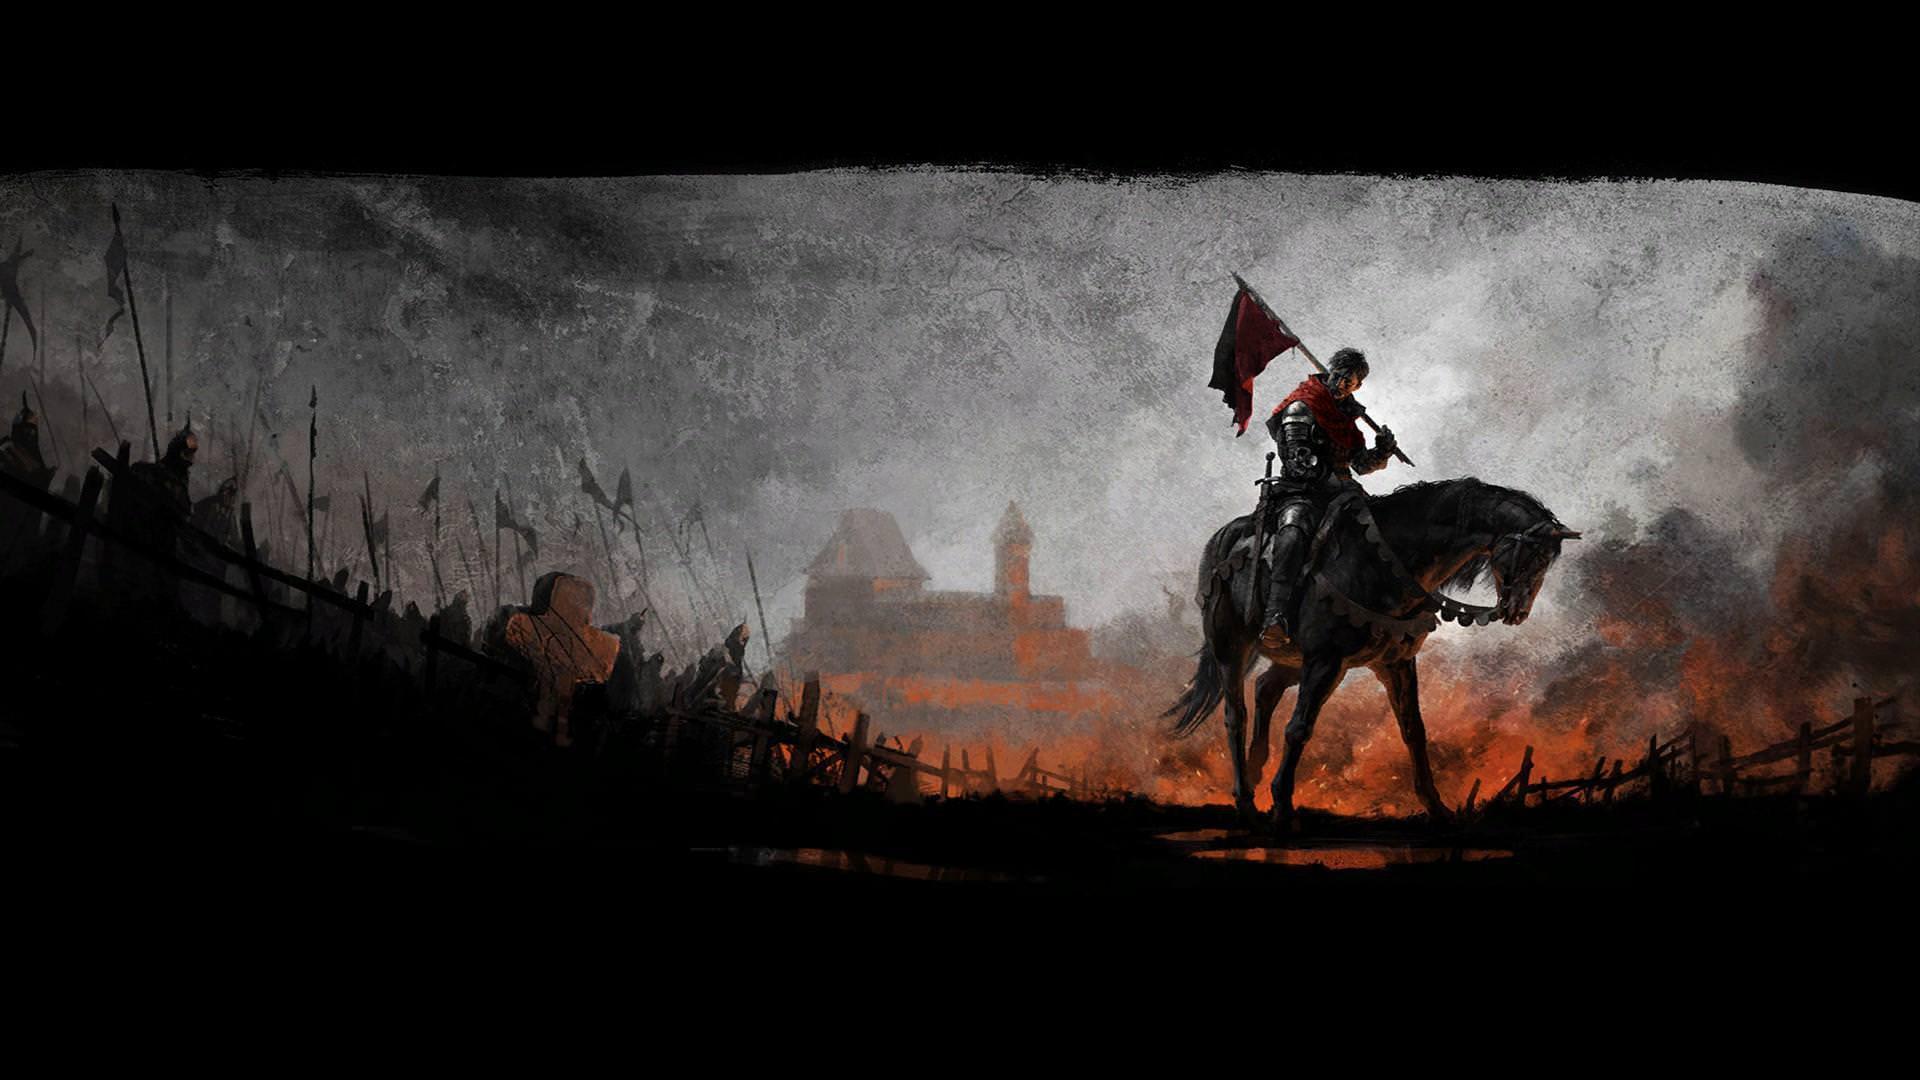 Kingdom Come: Deliverance HD Wallpapers - Wallpaper Cave